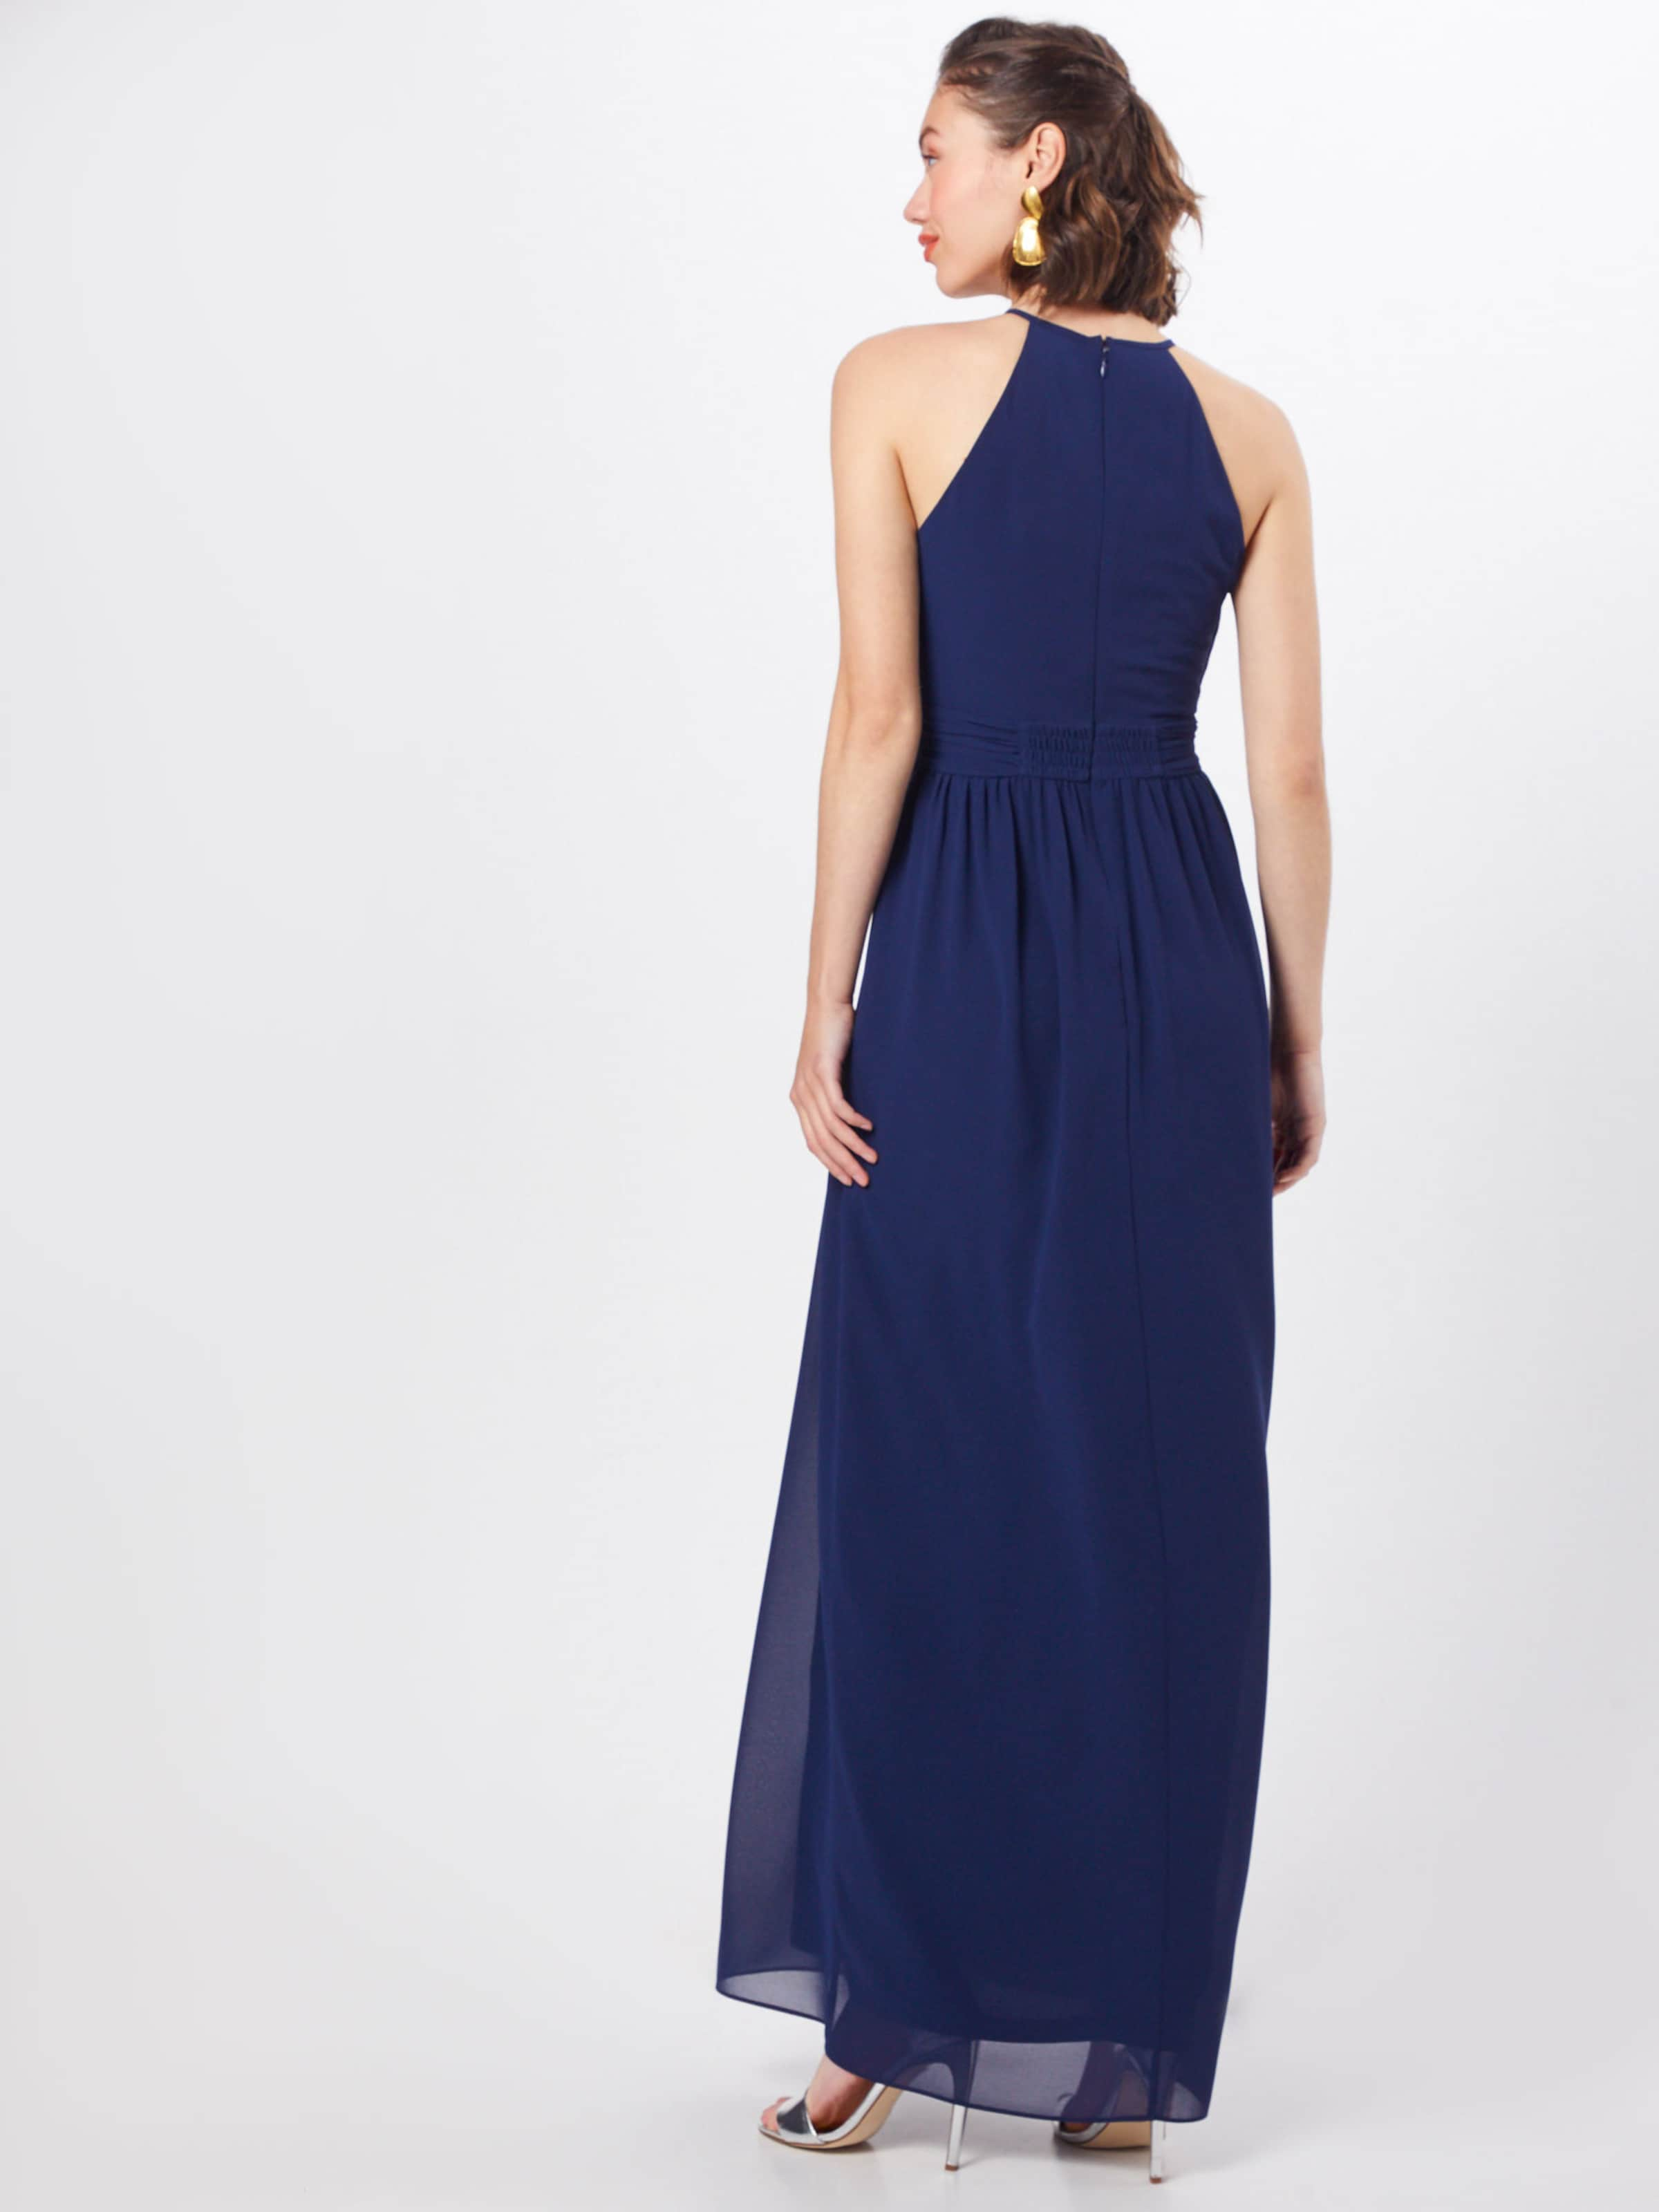 Bleu Marine Robe 'serene De Tfnc Maxi' En Soirée rCxoedB